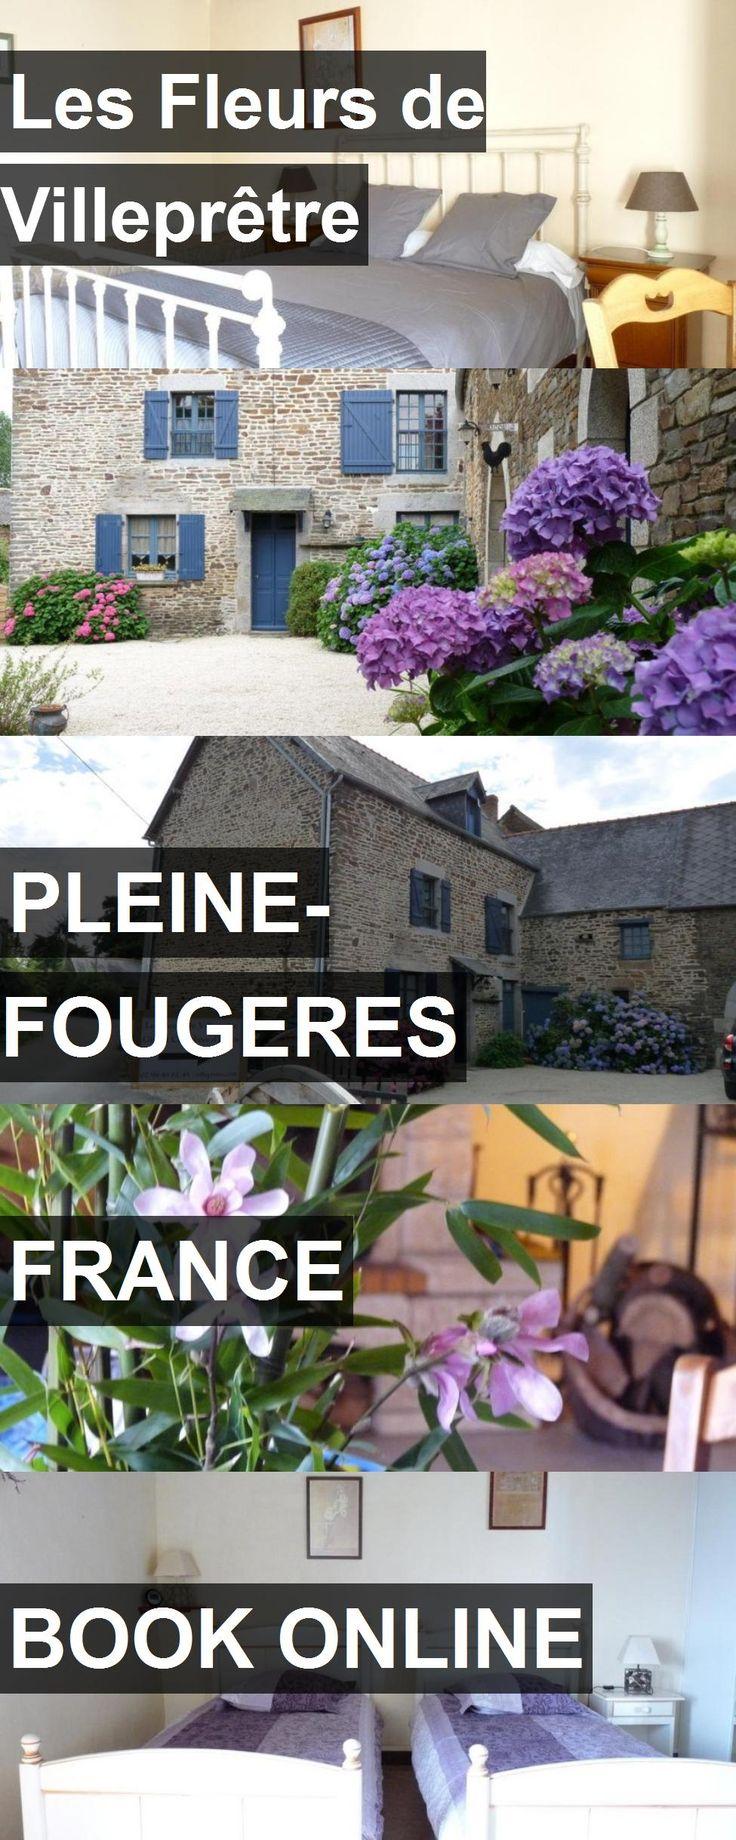 Hotel Les Fleurs de Villeprêtre in Pleine-Fougeres, France. For more information, photos, reviews and best prices please follow the link. #France #Pleine-Fougeres #travel #vacation #hotel